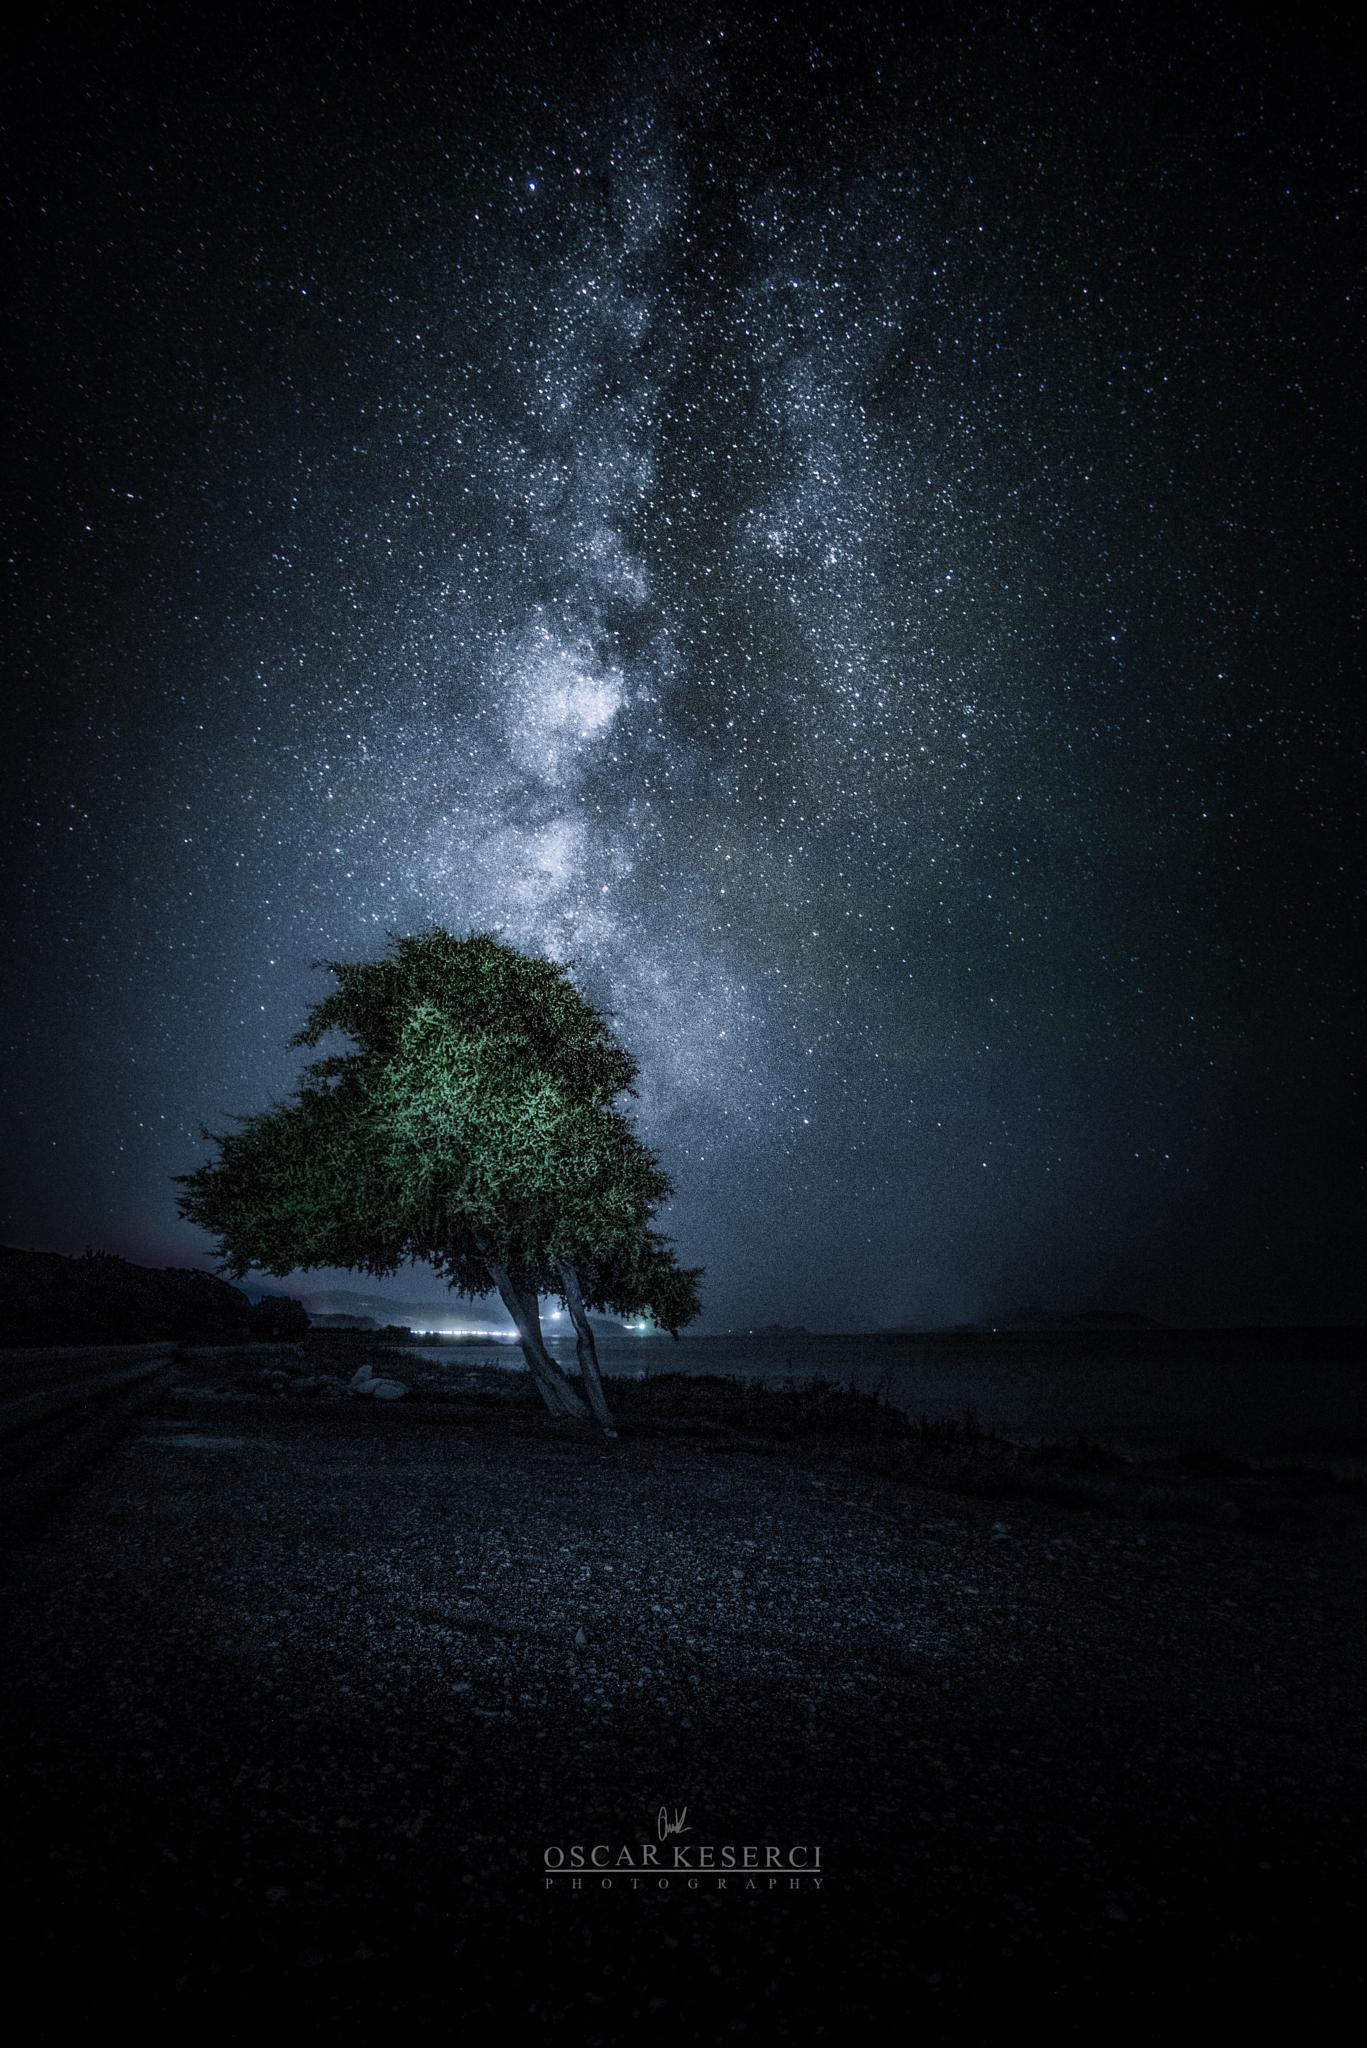 Galactic tree by oscar keserci